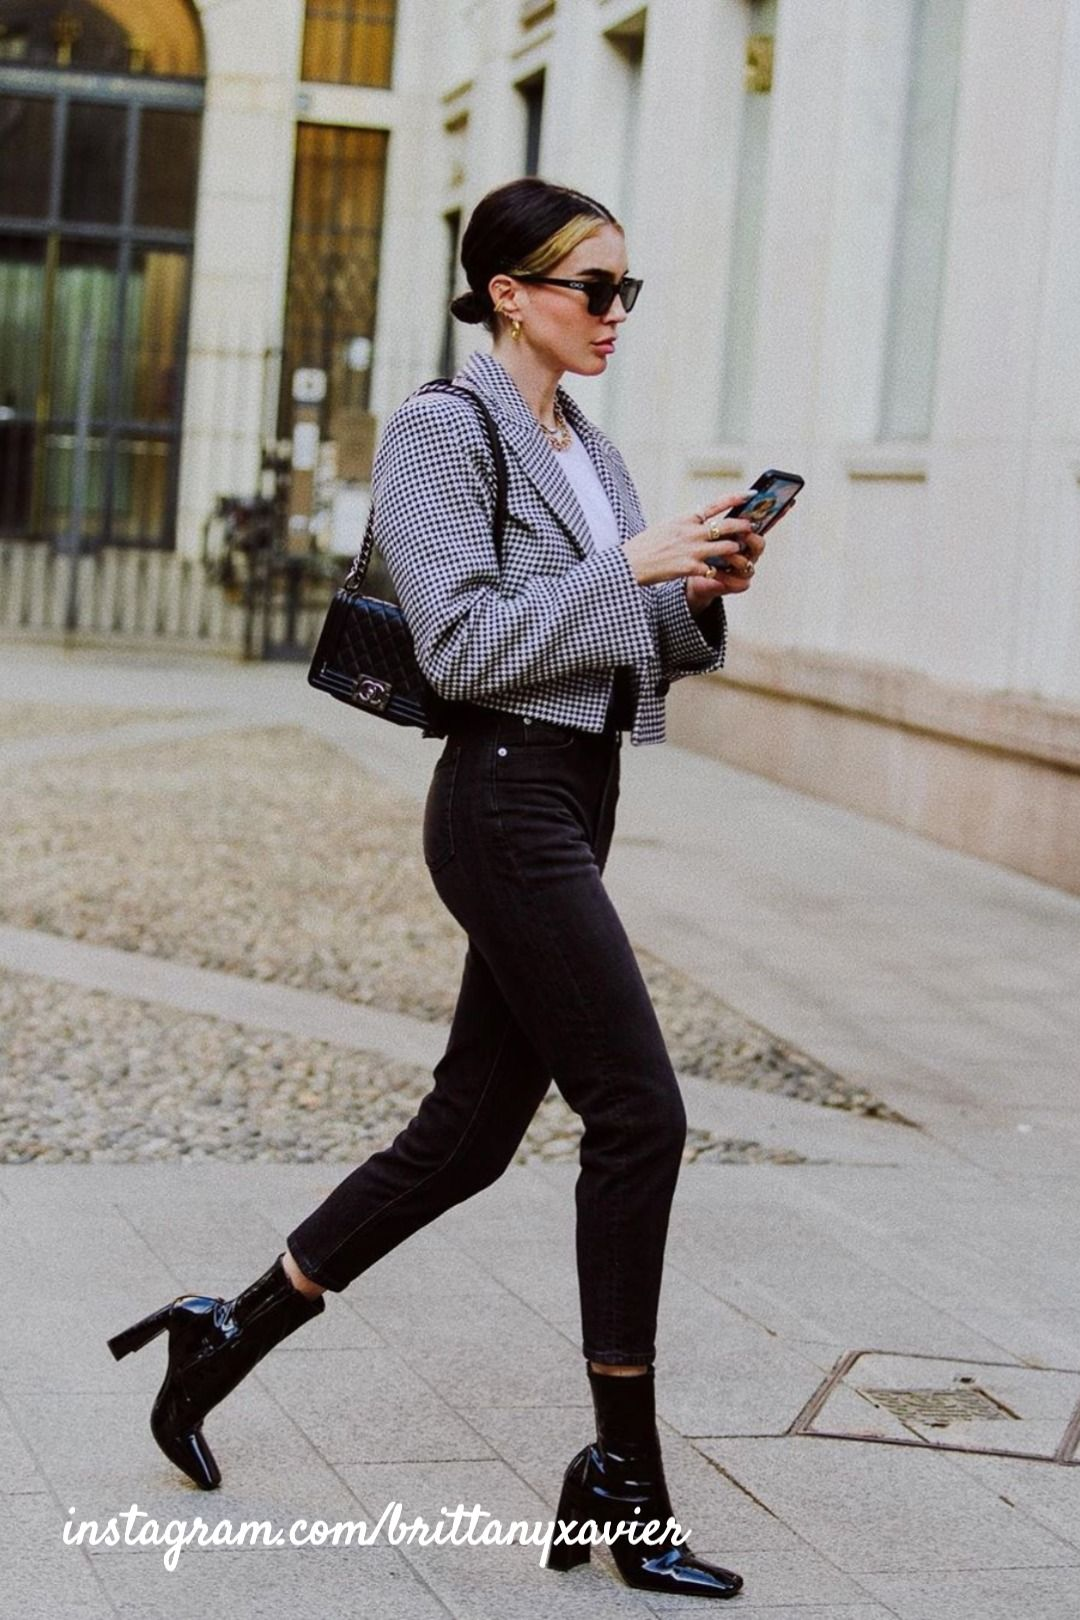 The Best Tiktok Accounts To Follow In Fashion Black Ankle Boots Outfit Black Ankle Boots Fashion